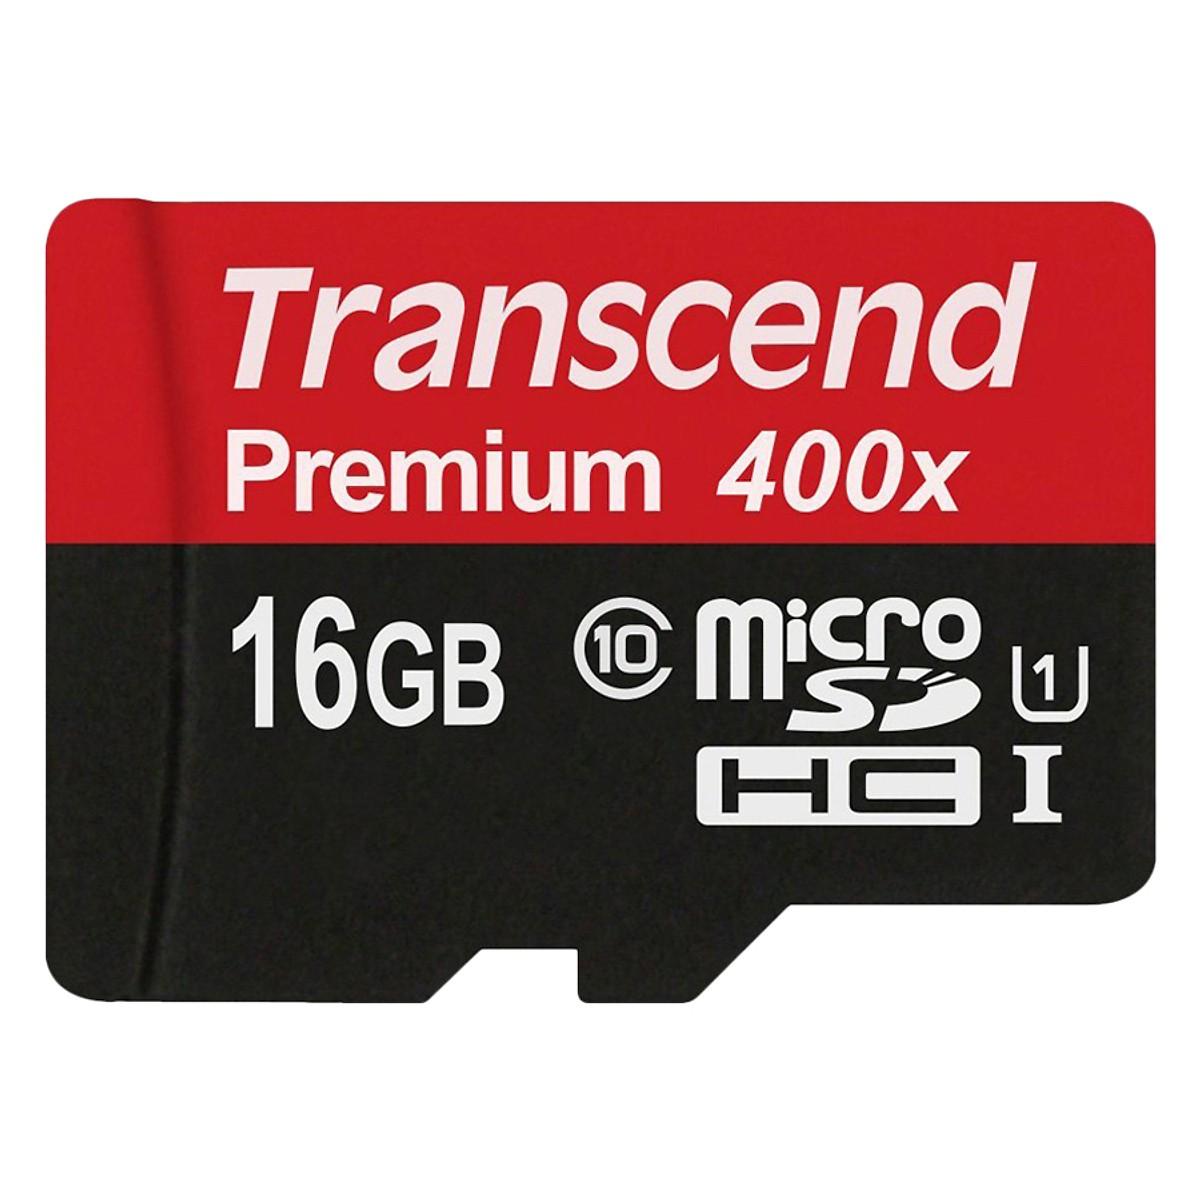 Transcend - Thẻ Nhớ Micro SD Premium Transcend 16GB Class 10